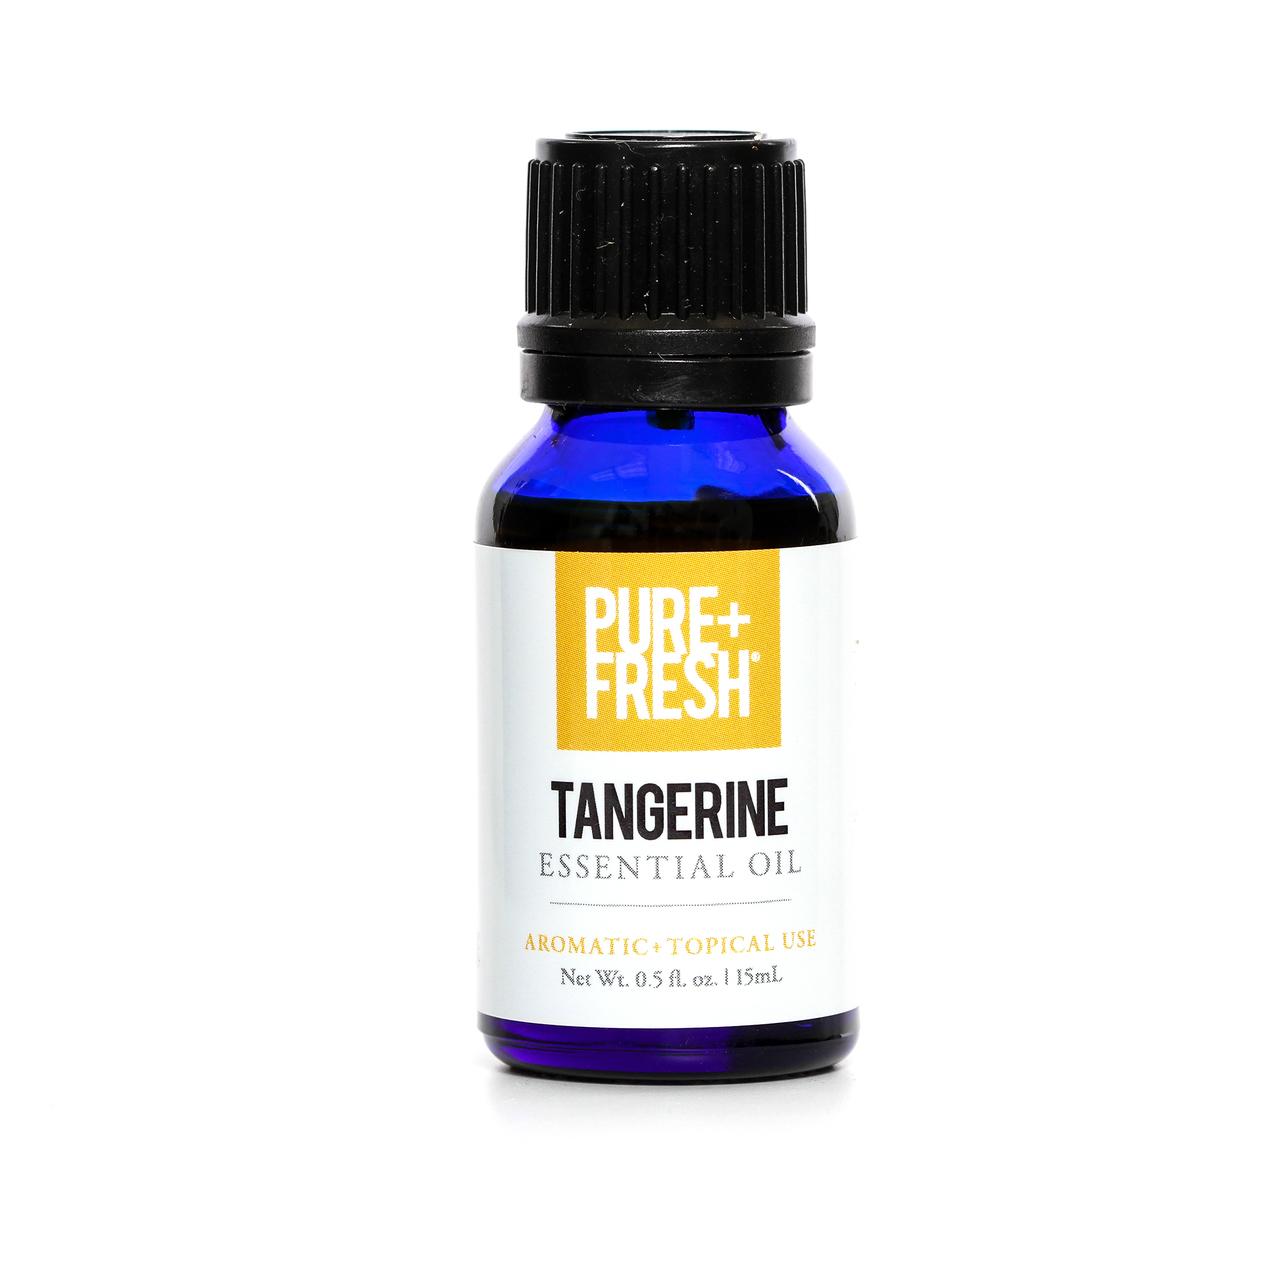 0.5fl oz. Bottle of Pure+Fresh Tangerine Essential Oil